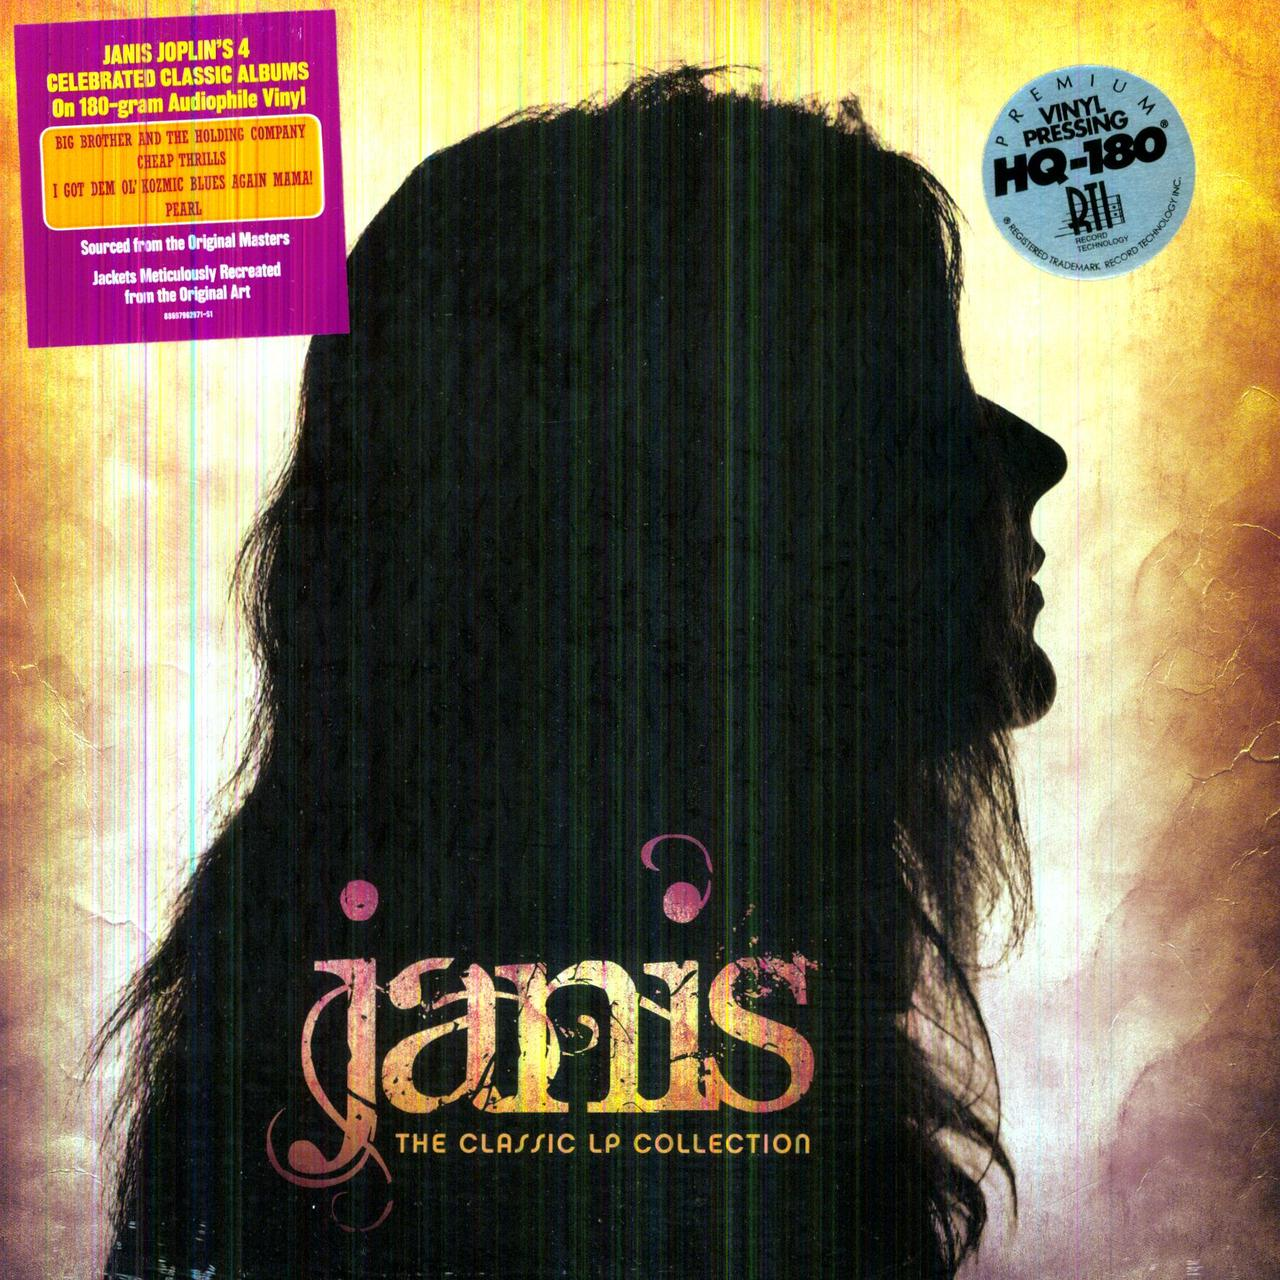 Janis Joplin CLASSIC LP COLLECTION Vinyl Record